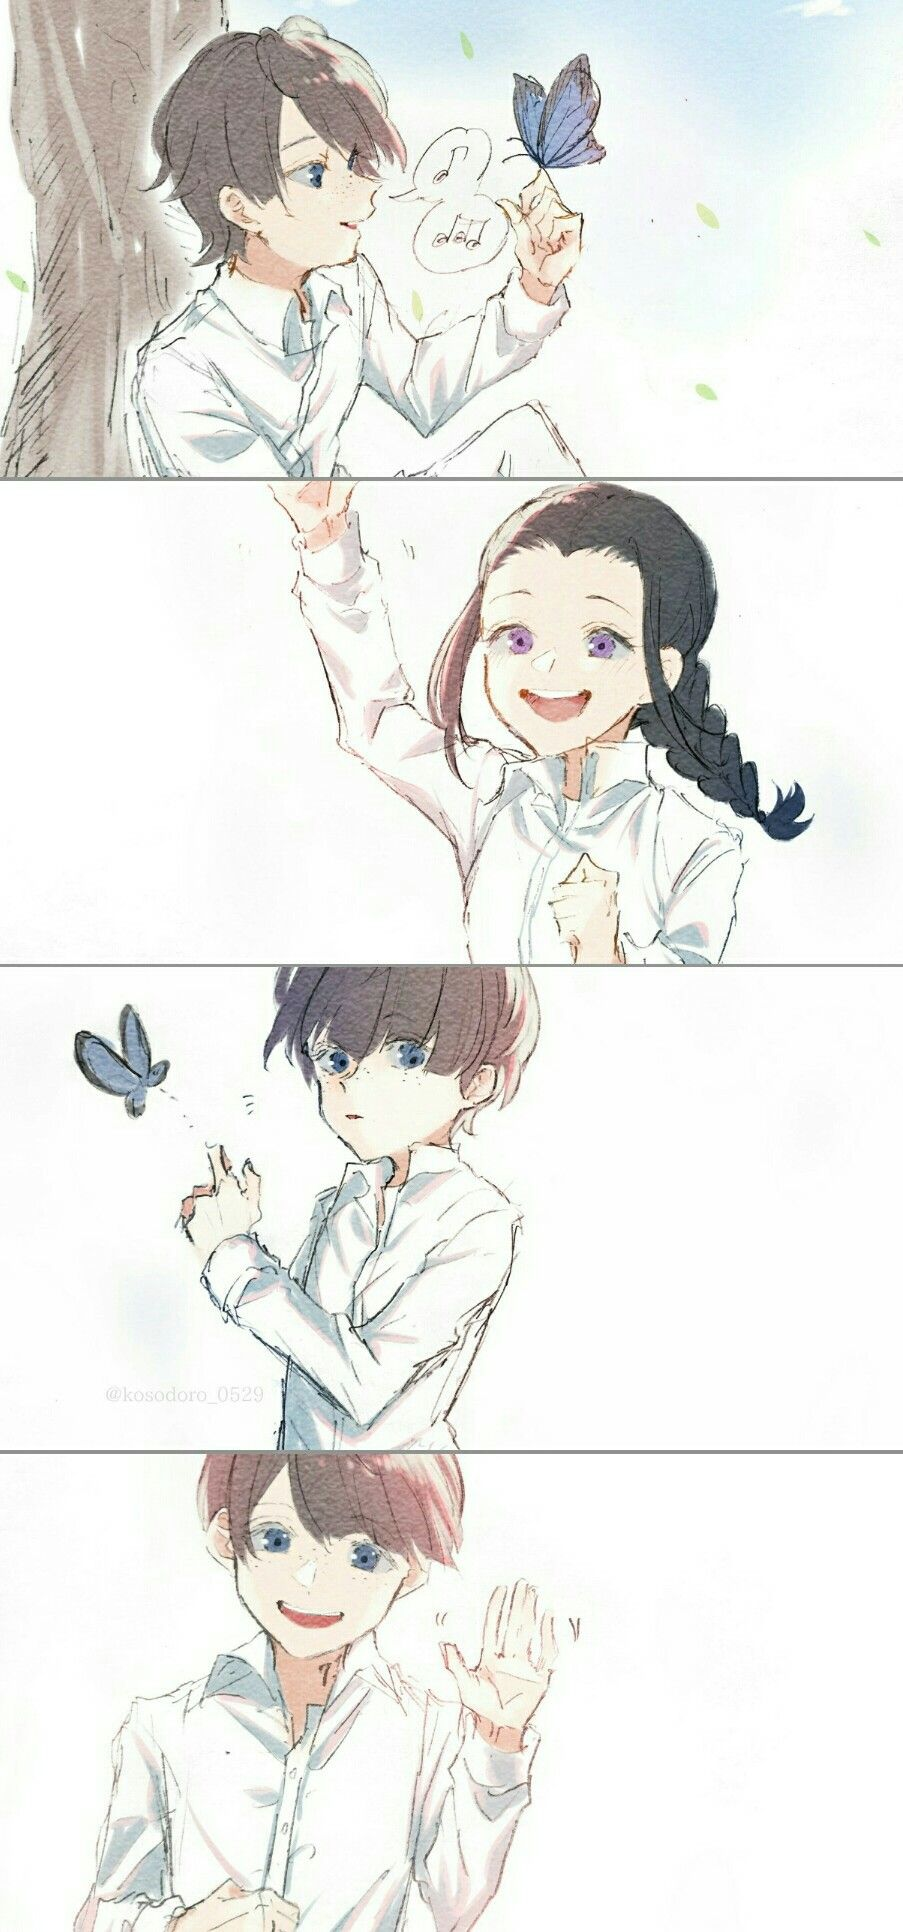 Leslie & Isabella | The Promised Neverland | Anime | Anime